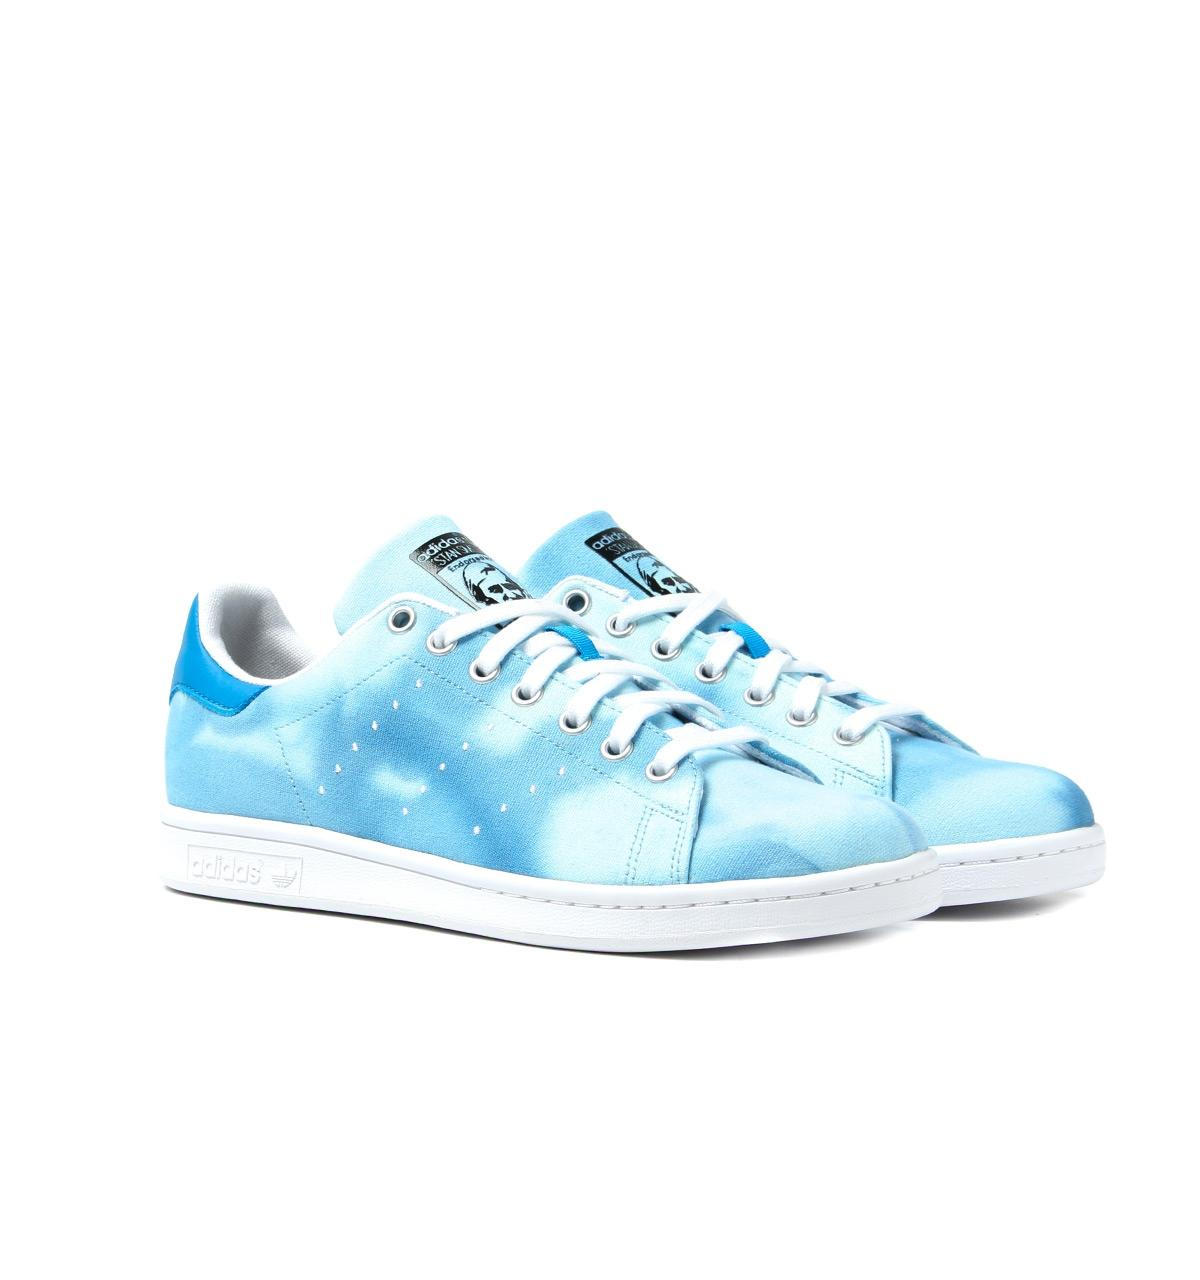 newest 03762 33a1c adidas Originals Pharrell X Adidas Blue Hu Holi Stan Smith ...